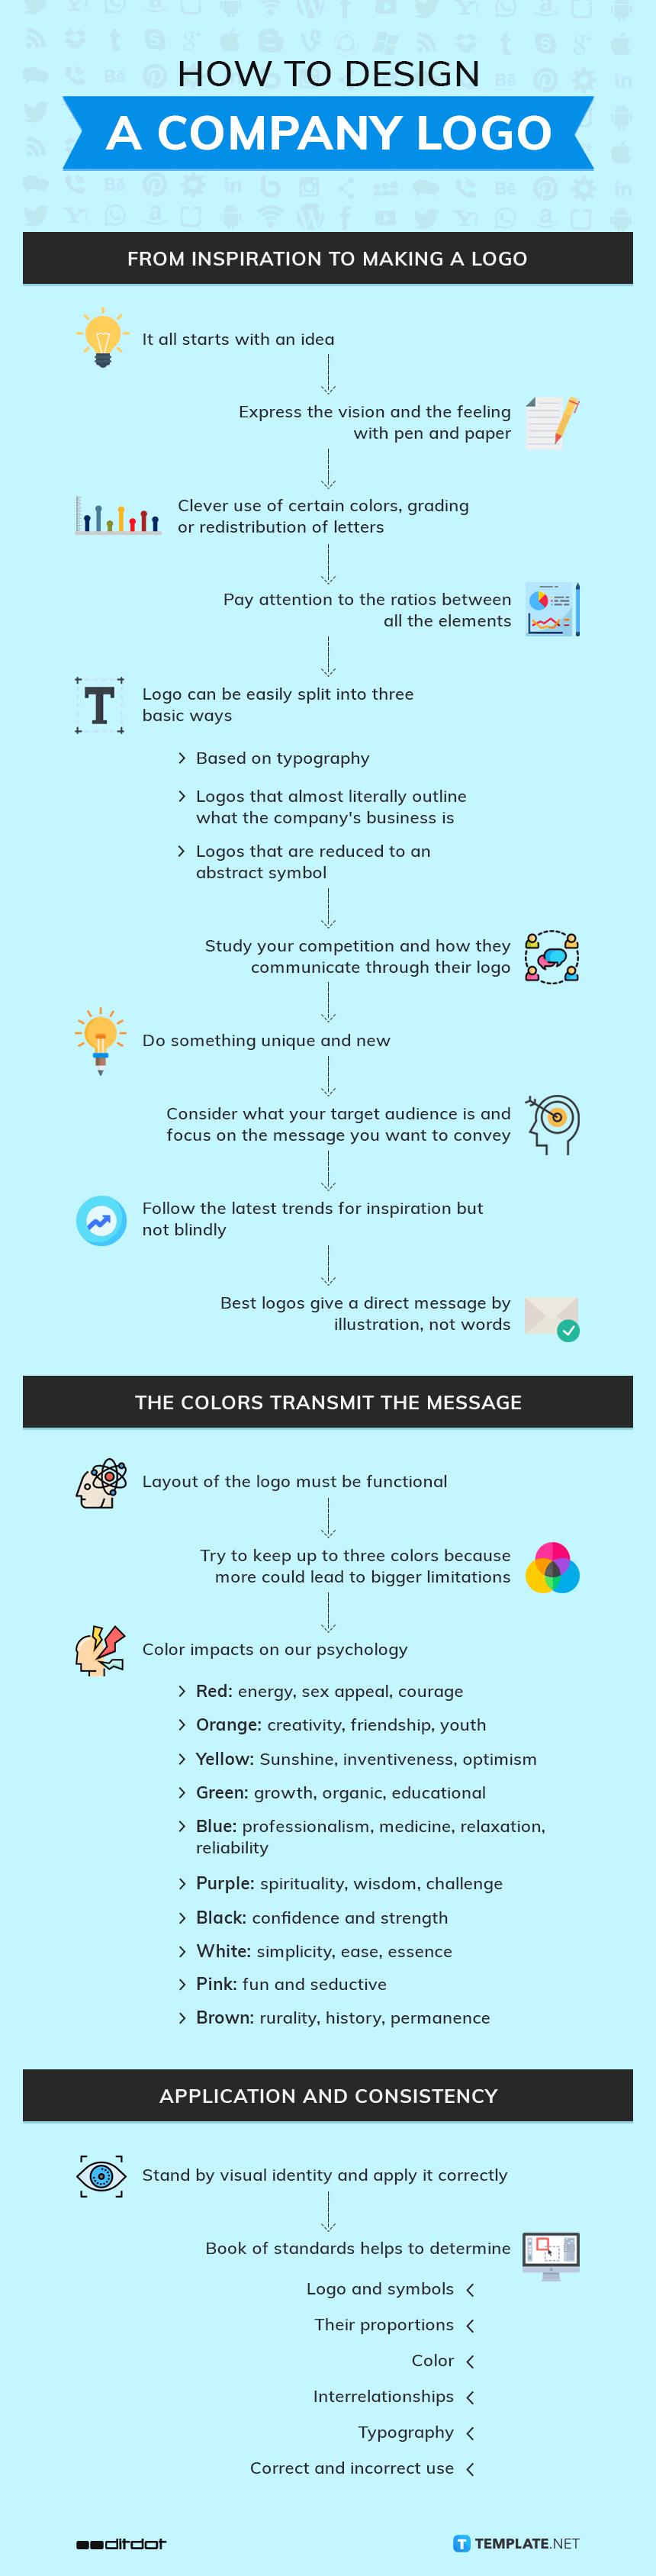 How to design a company logo infographic